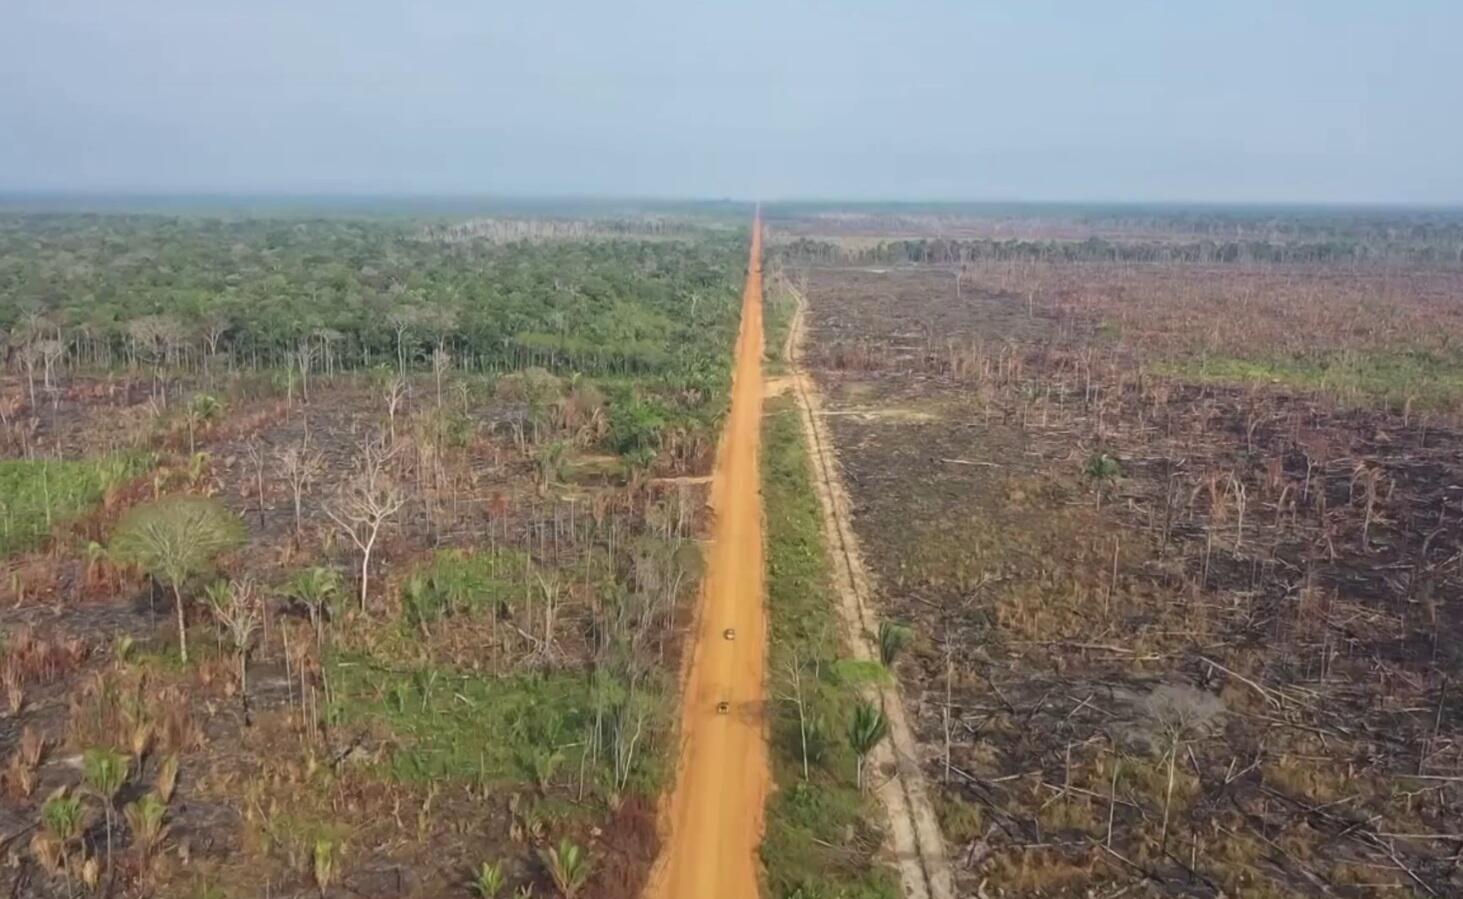 Bild zu Regenwald, Rodung, Bolsonaro